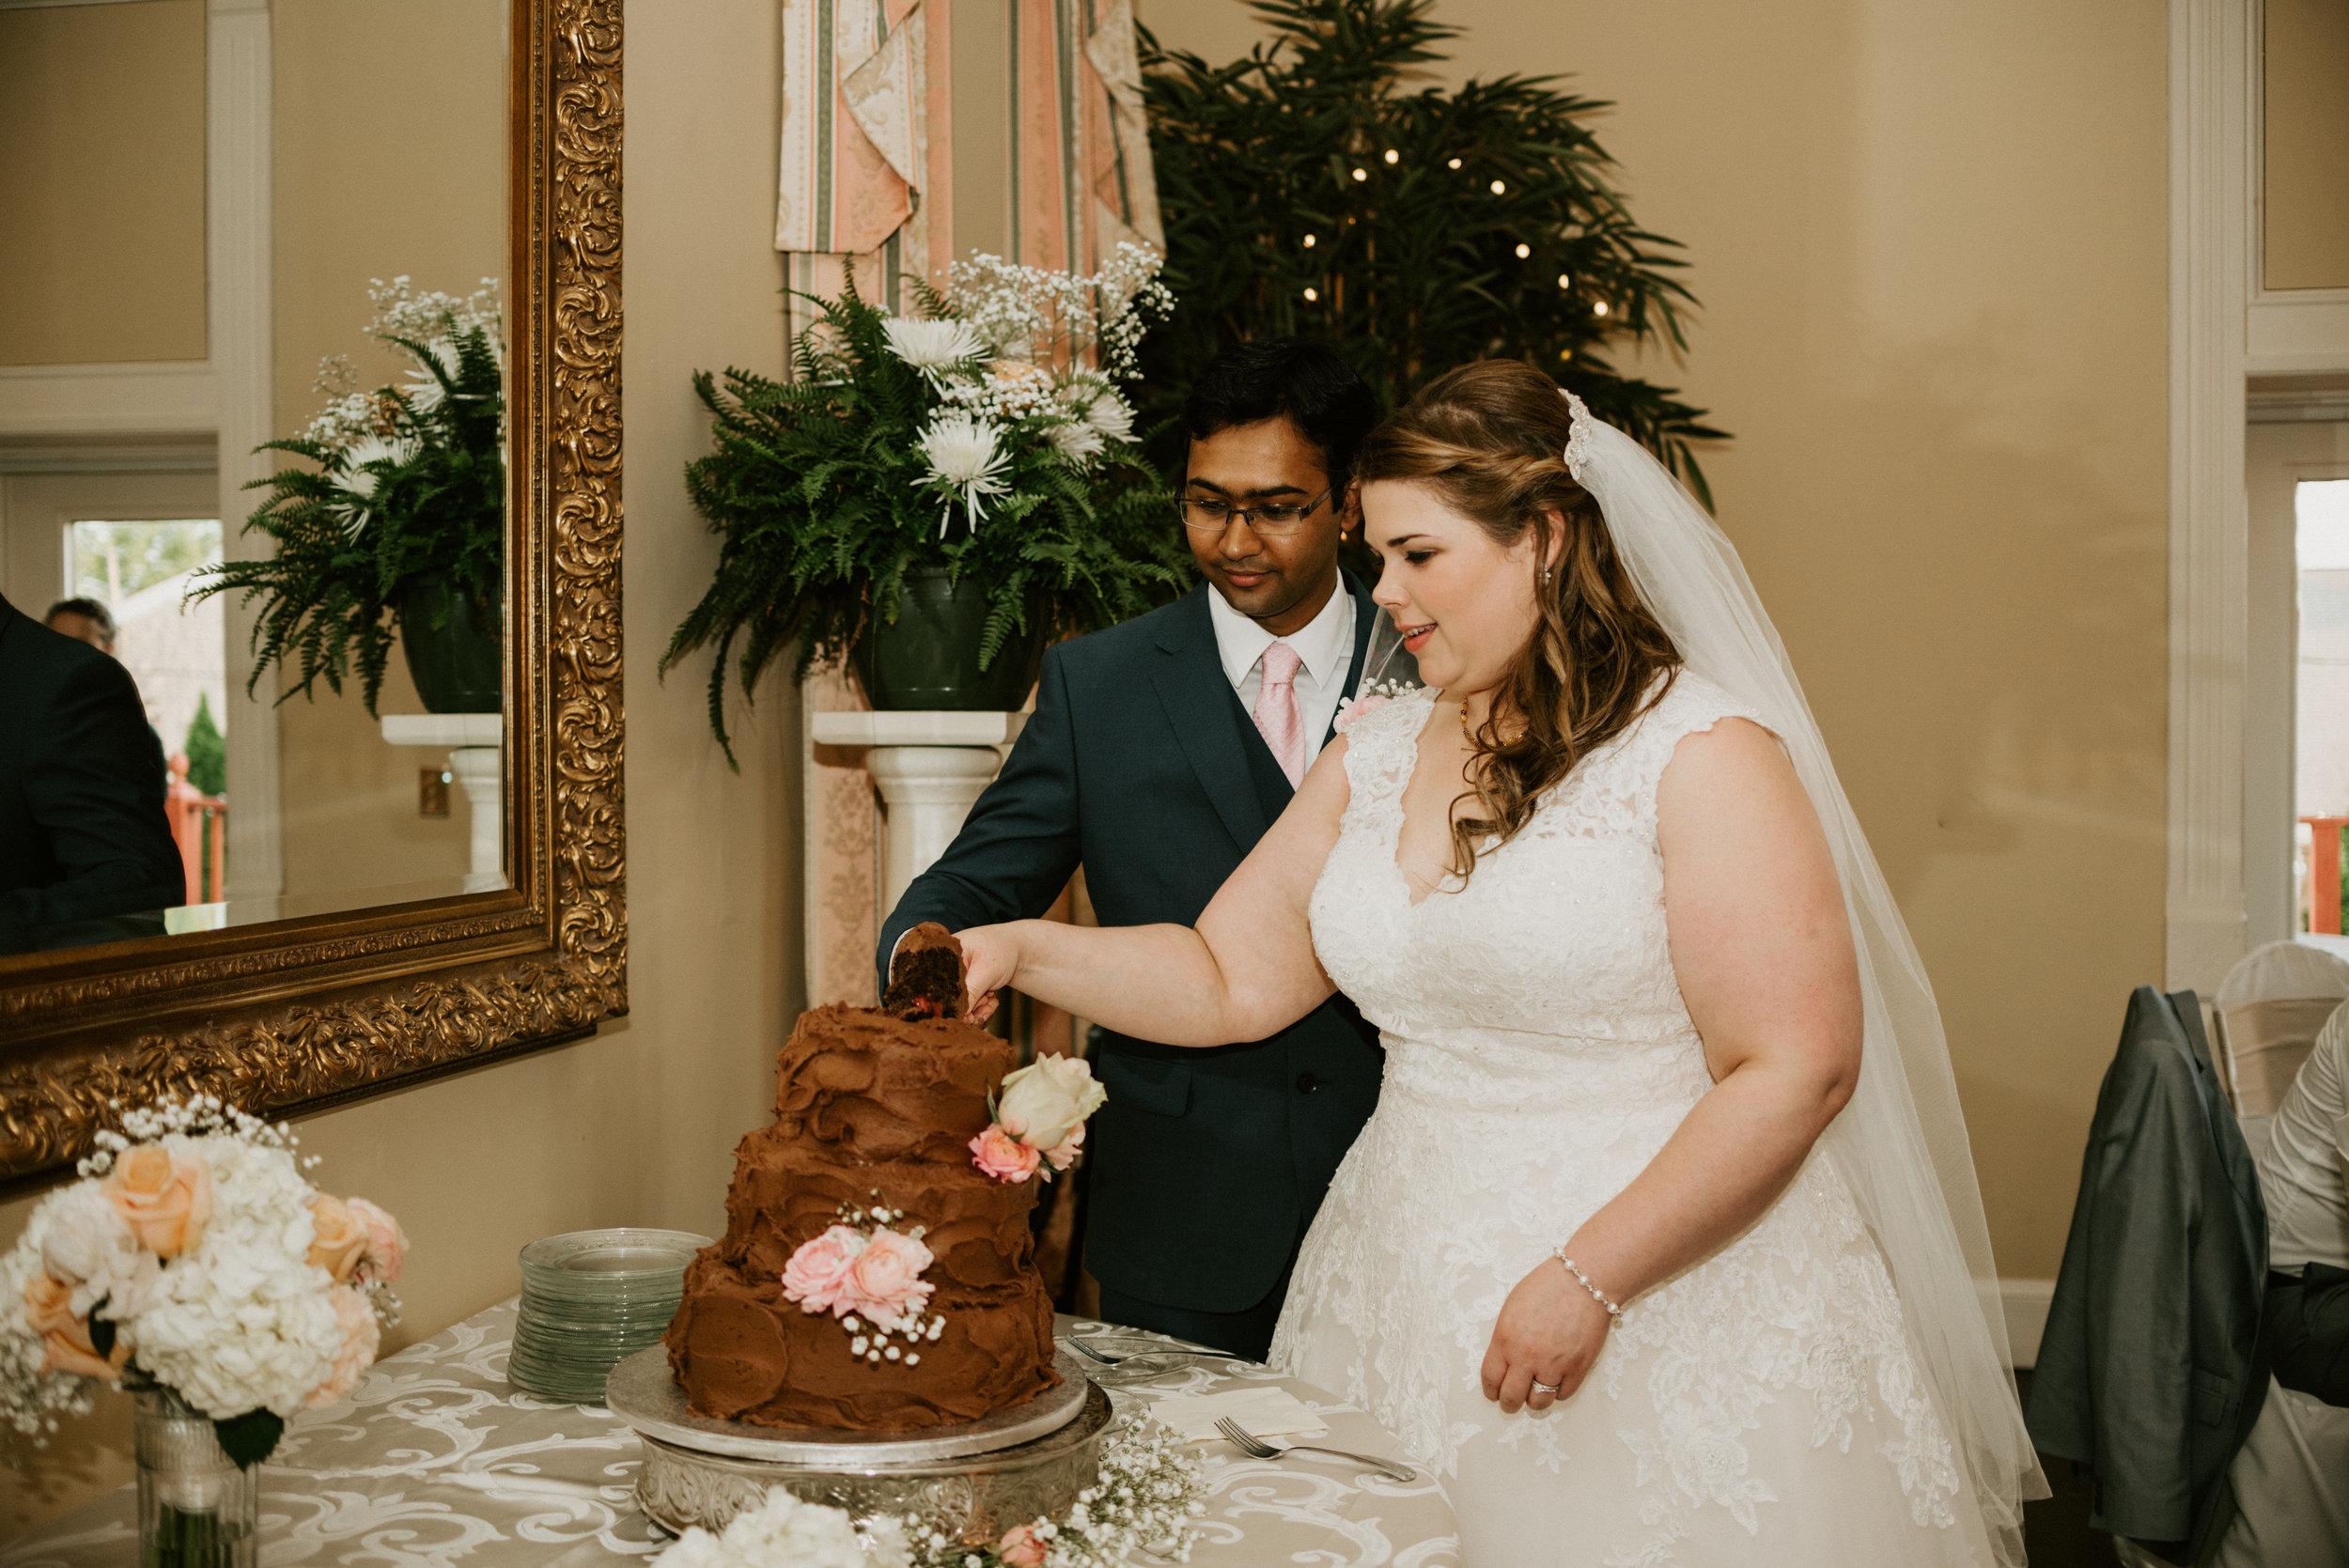 WonderlyCreative_Wedding_5.12.18_Megan&Swapnil_-966.jpg